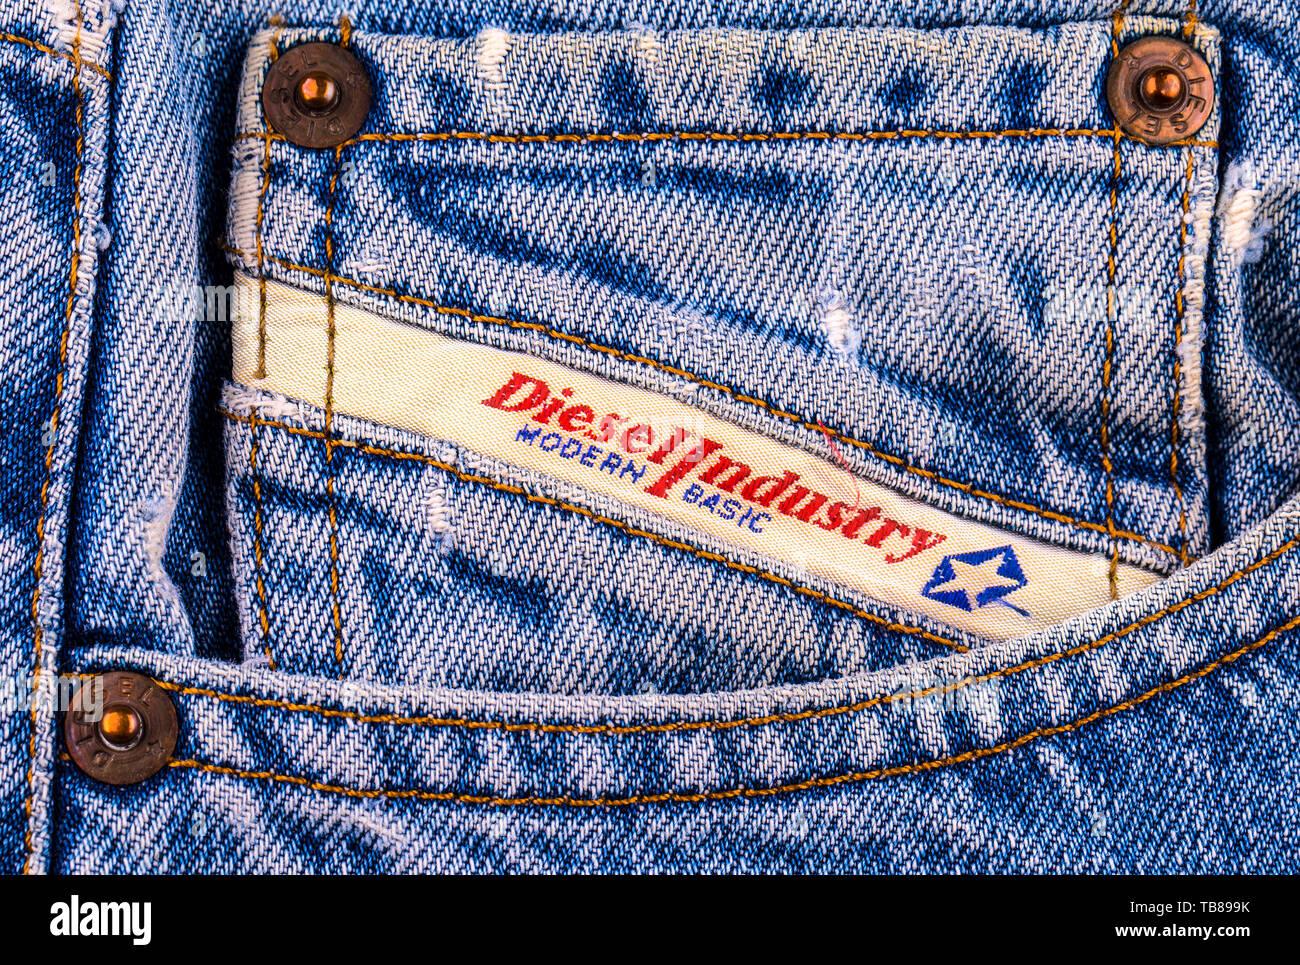 90564da7 Chisinau, Moldova February 10, 2017: Back pocket jeans Diesel. Diesel -  Italian